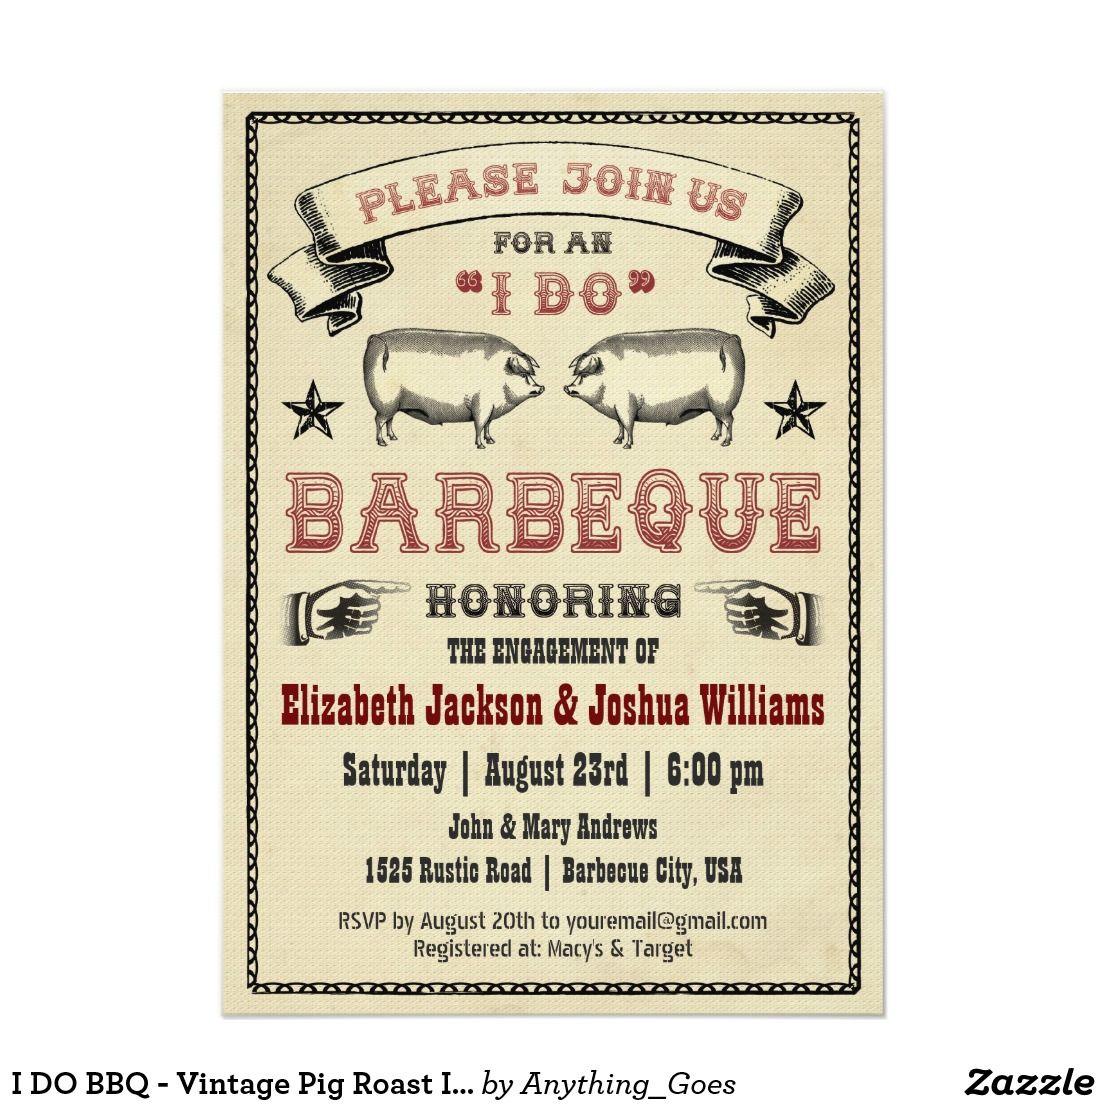 I DO BBQ - Vintage Pig Roast Invitation | Pig roast, Couple shower ...